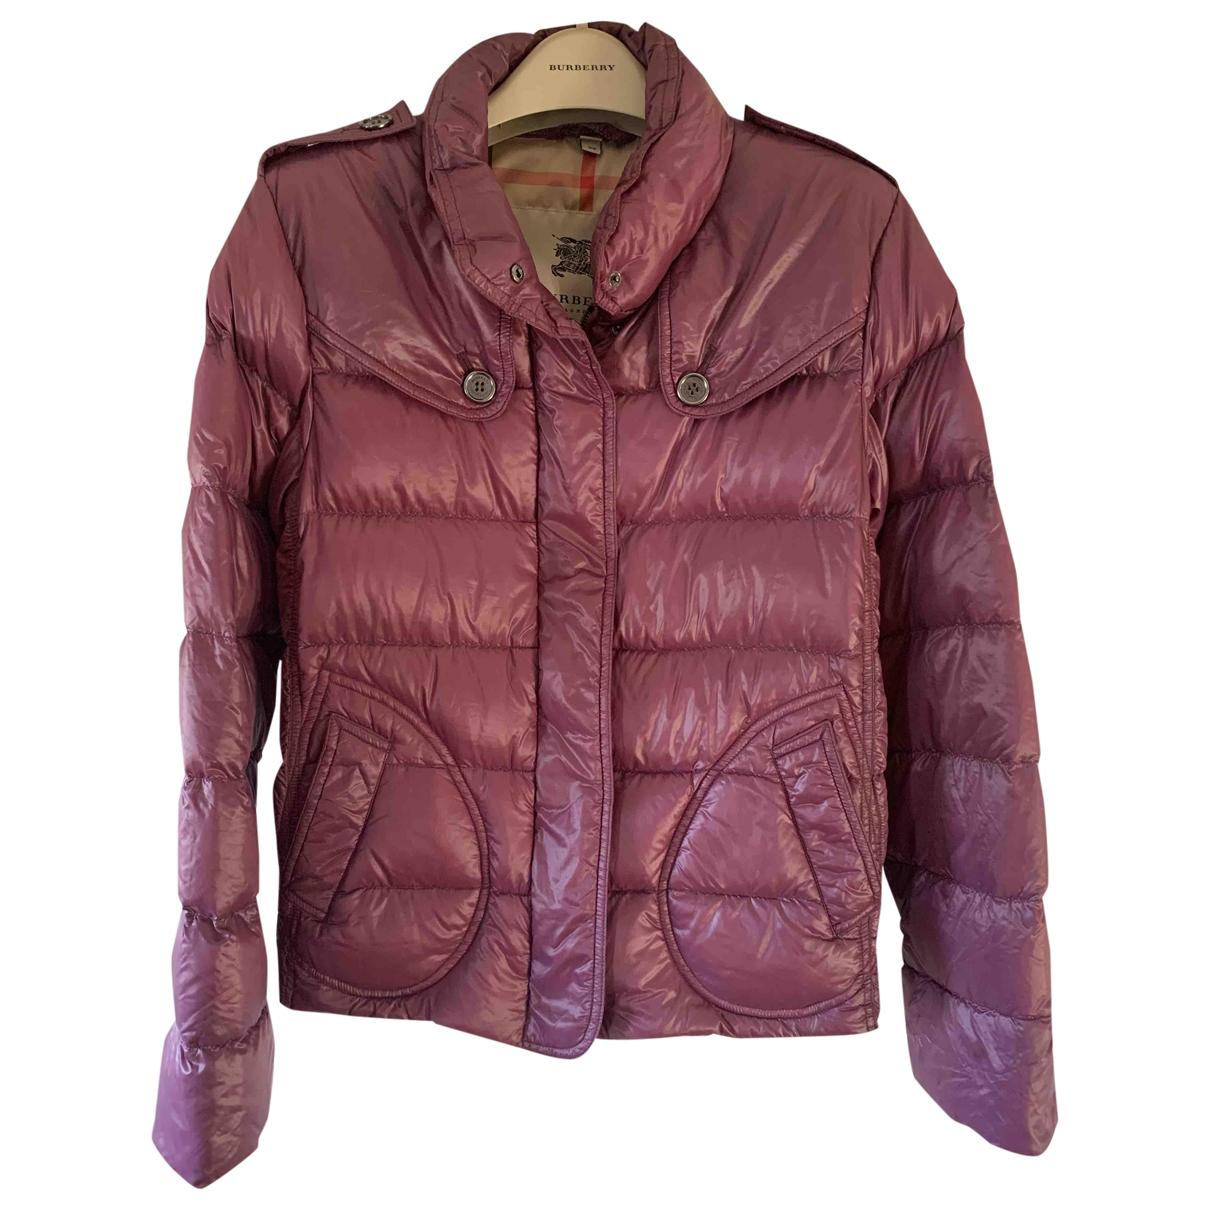 Burberry \N coat for Women XS International